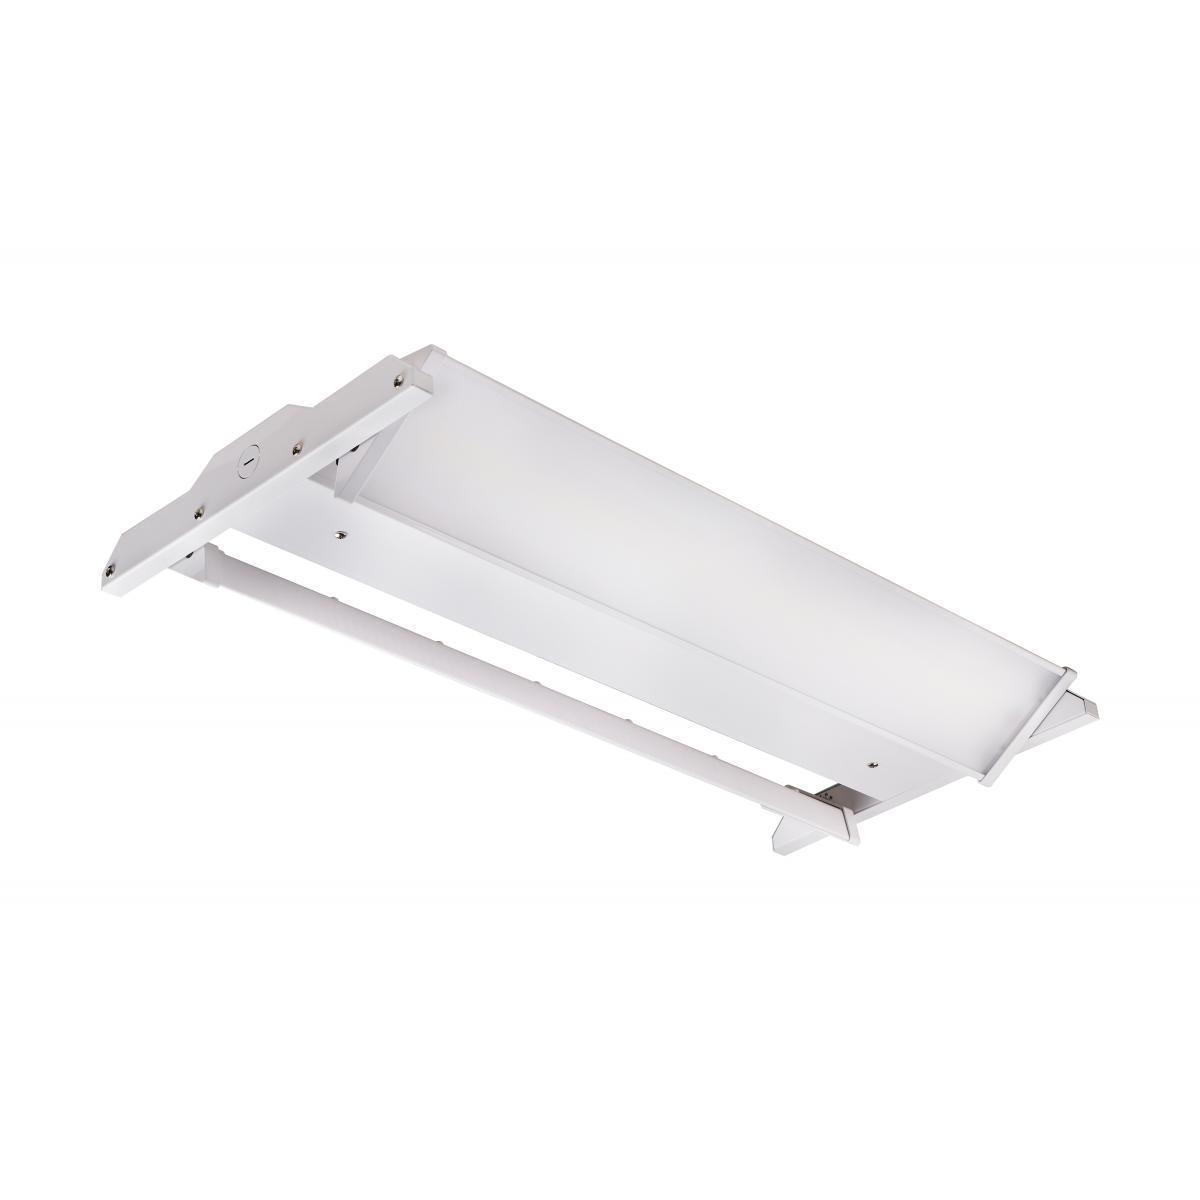 65-641 110W LED ADJUSTABLE HIGH BAY